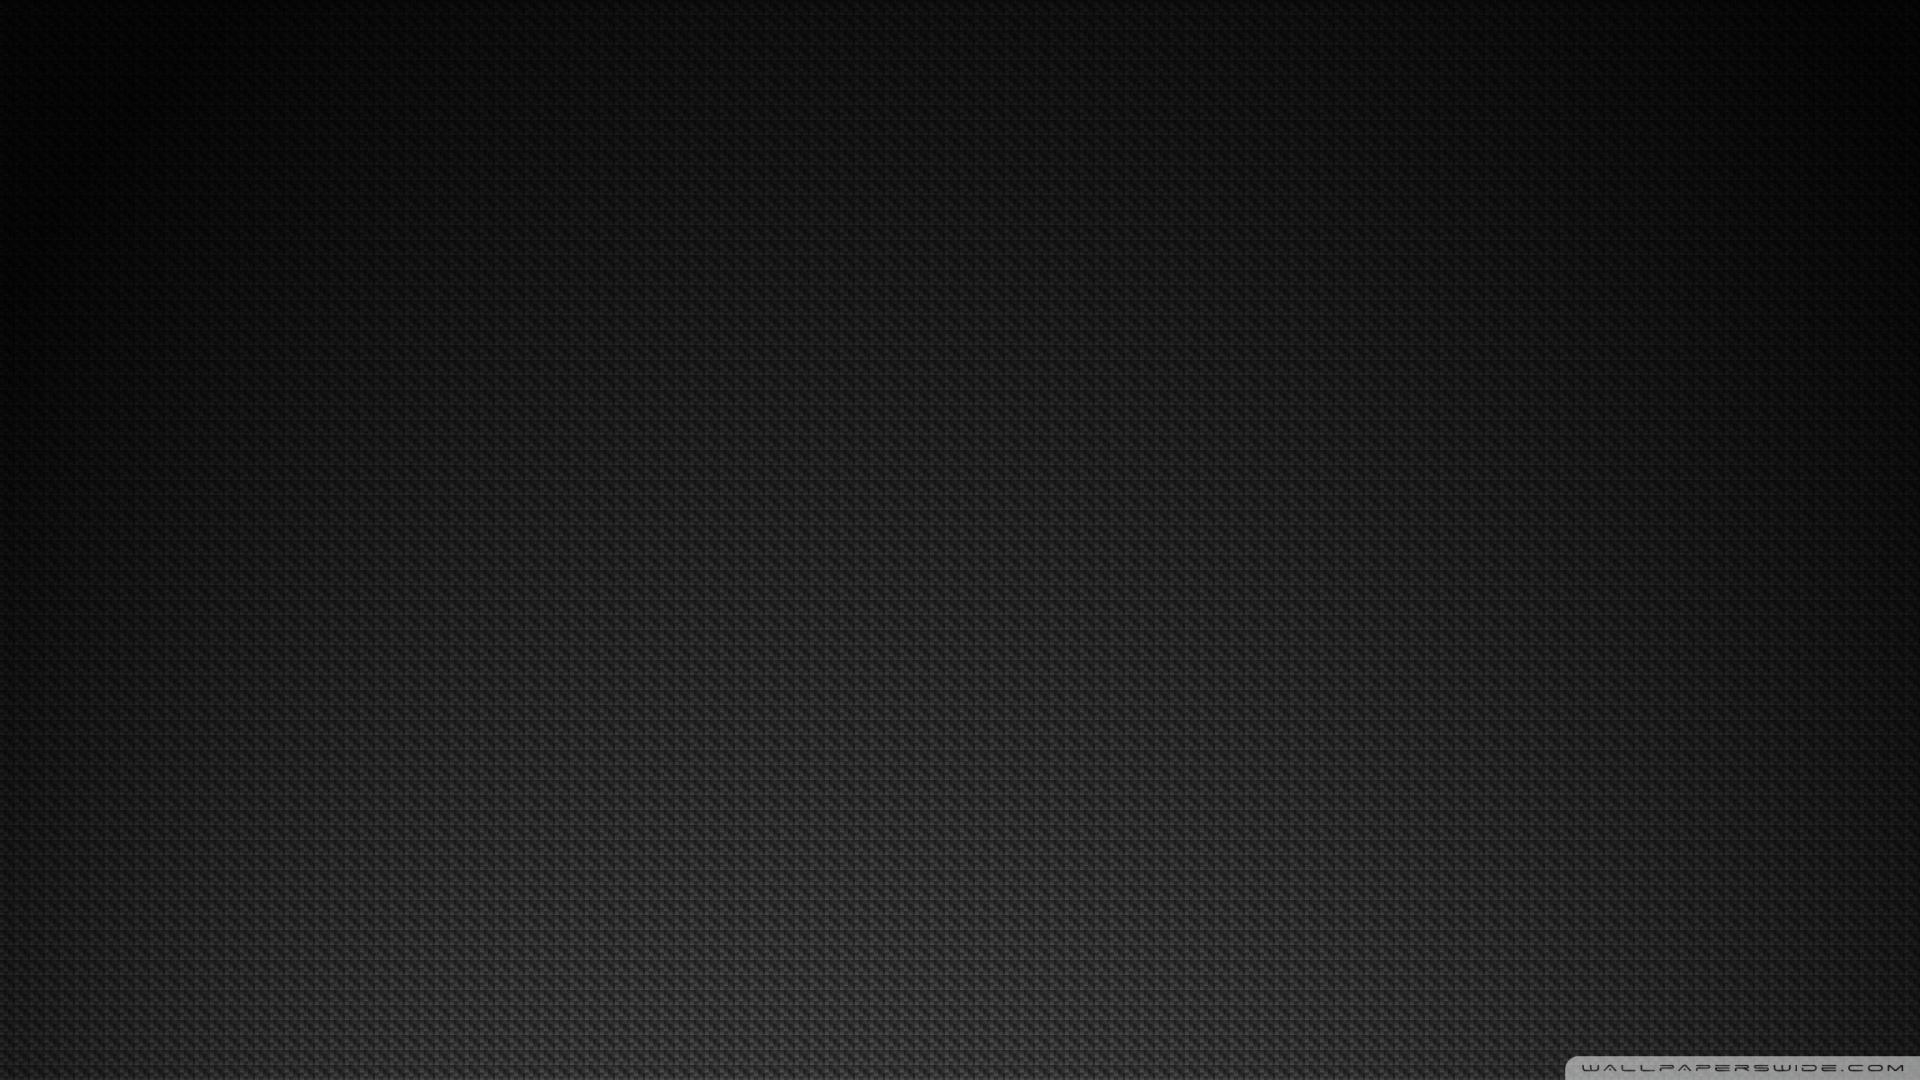 Carbon Fiber Background 1920x1080 1920x1080